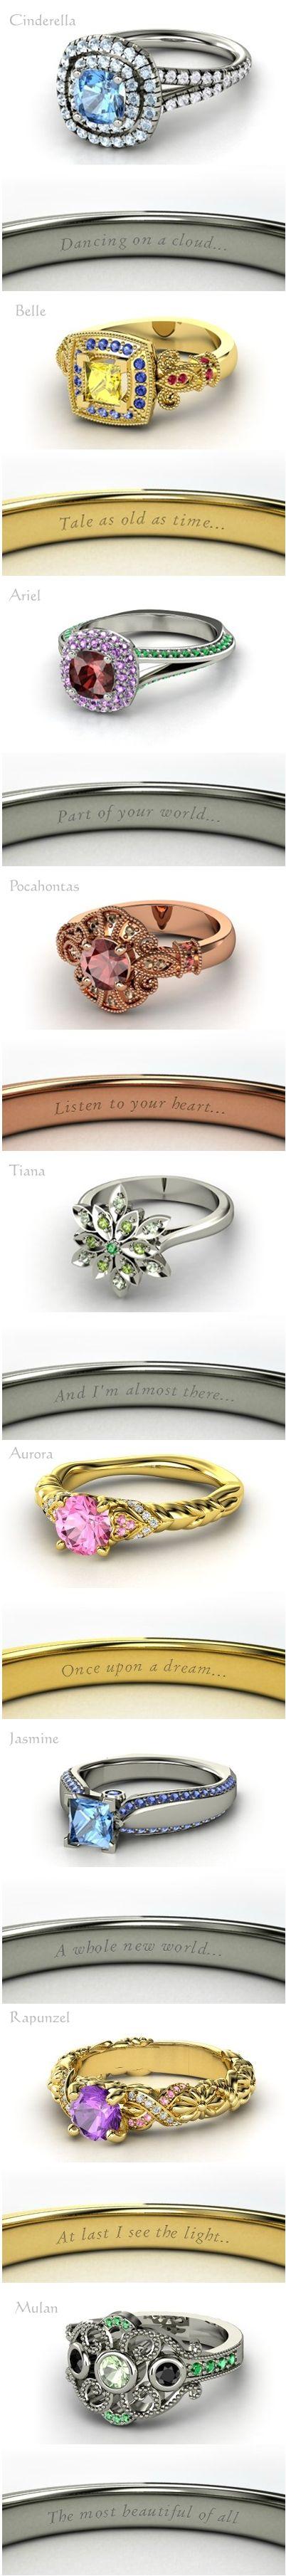 Disney princess rings. :D